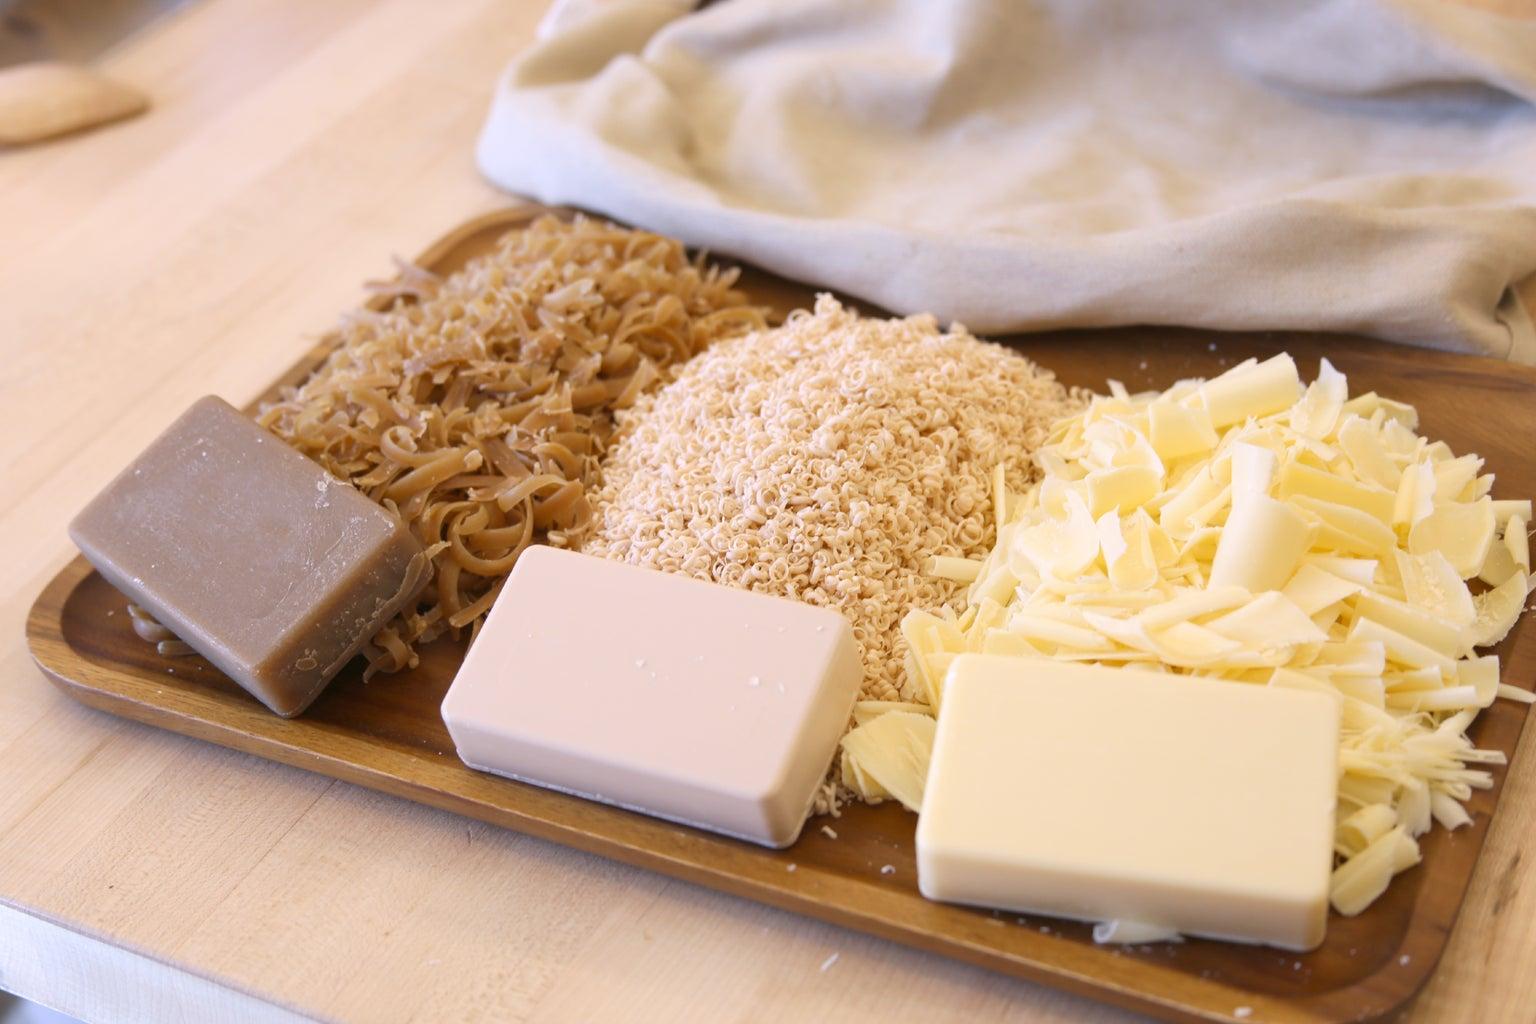 Grating Soap Bars